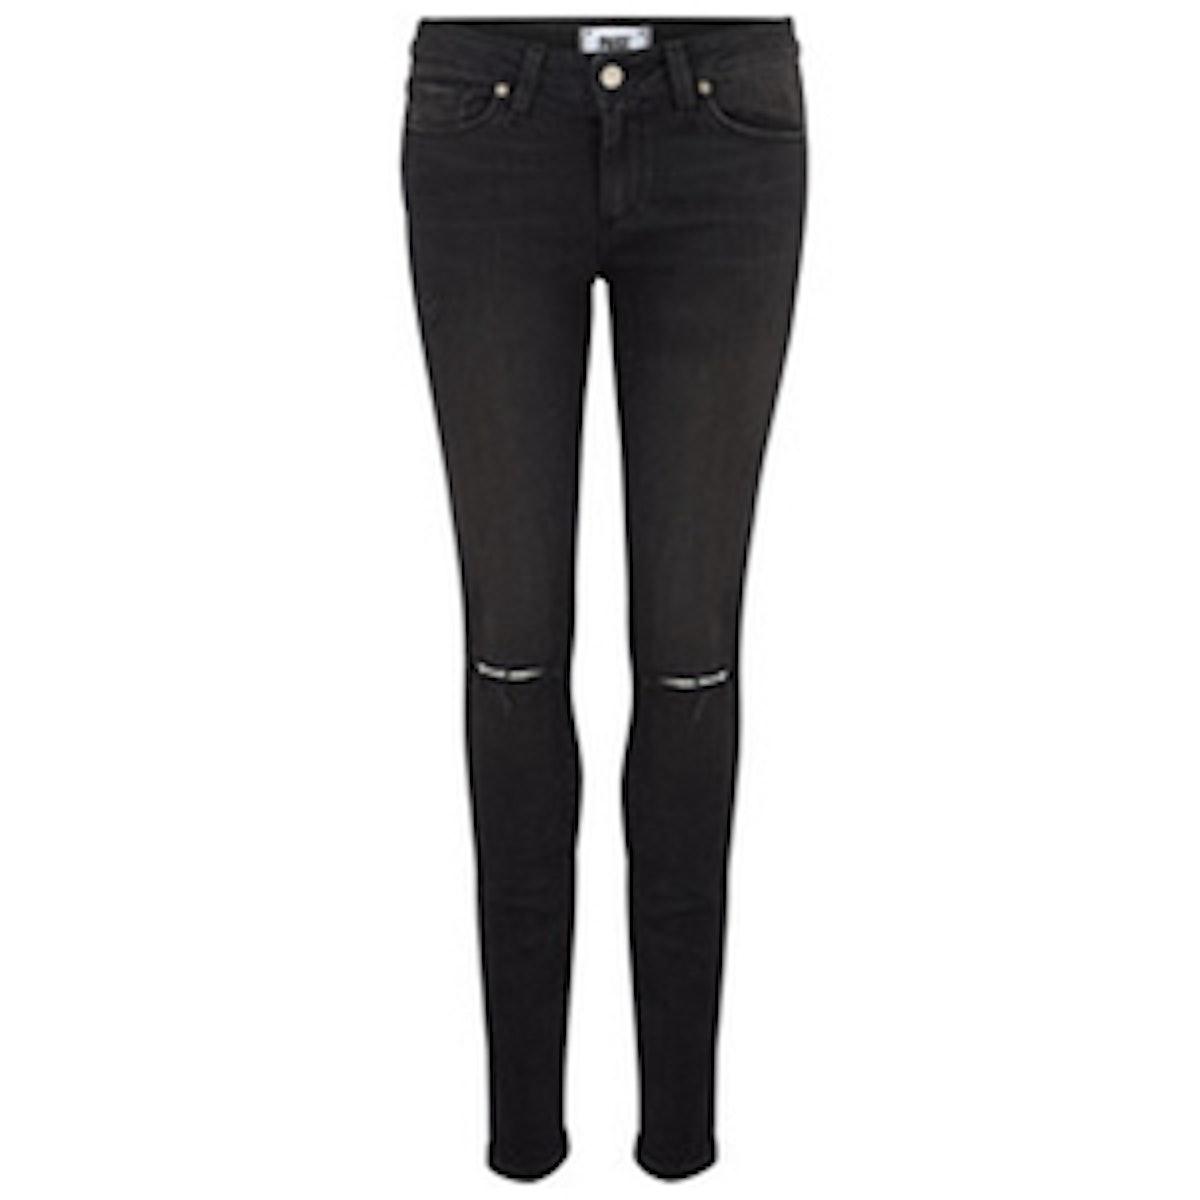 Verdugo Ultra Skinny Jean